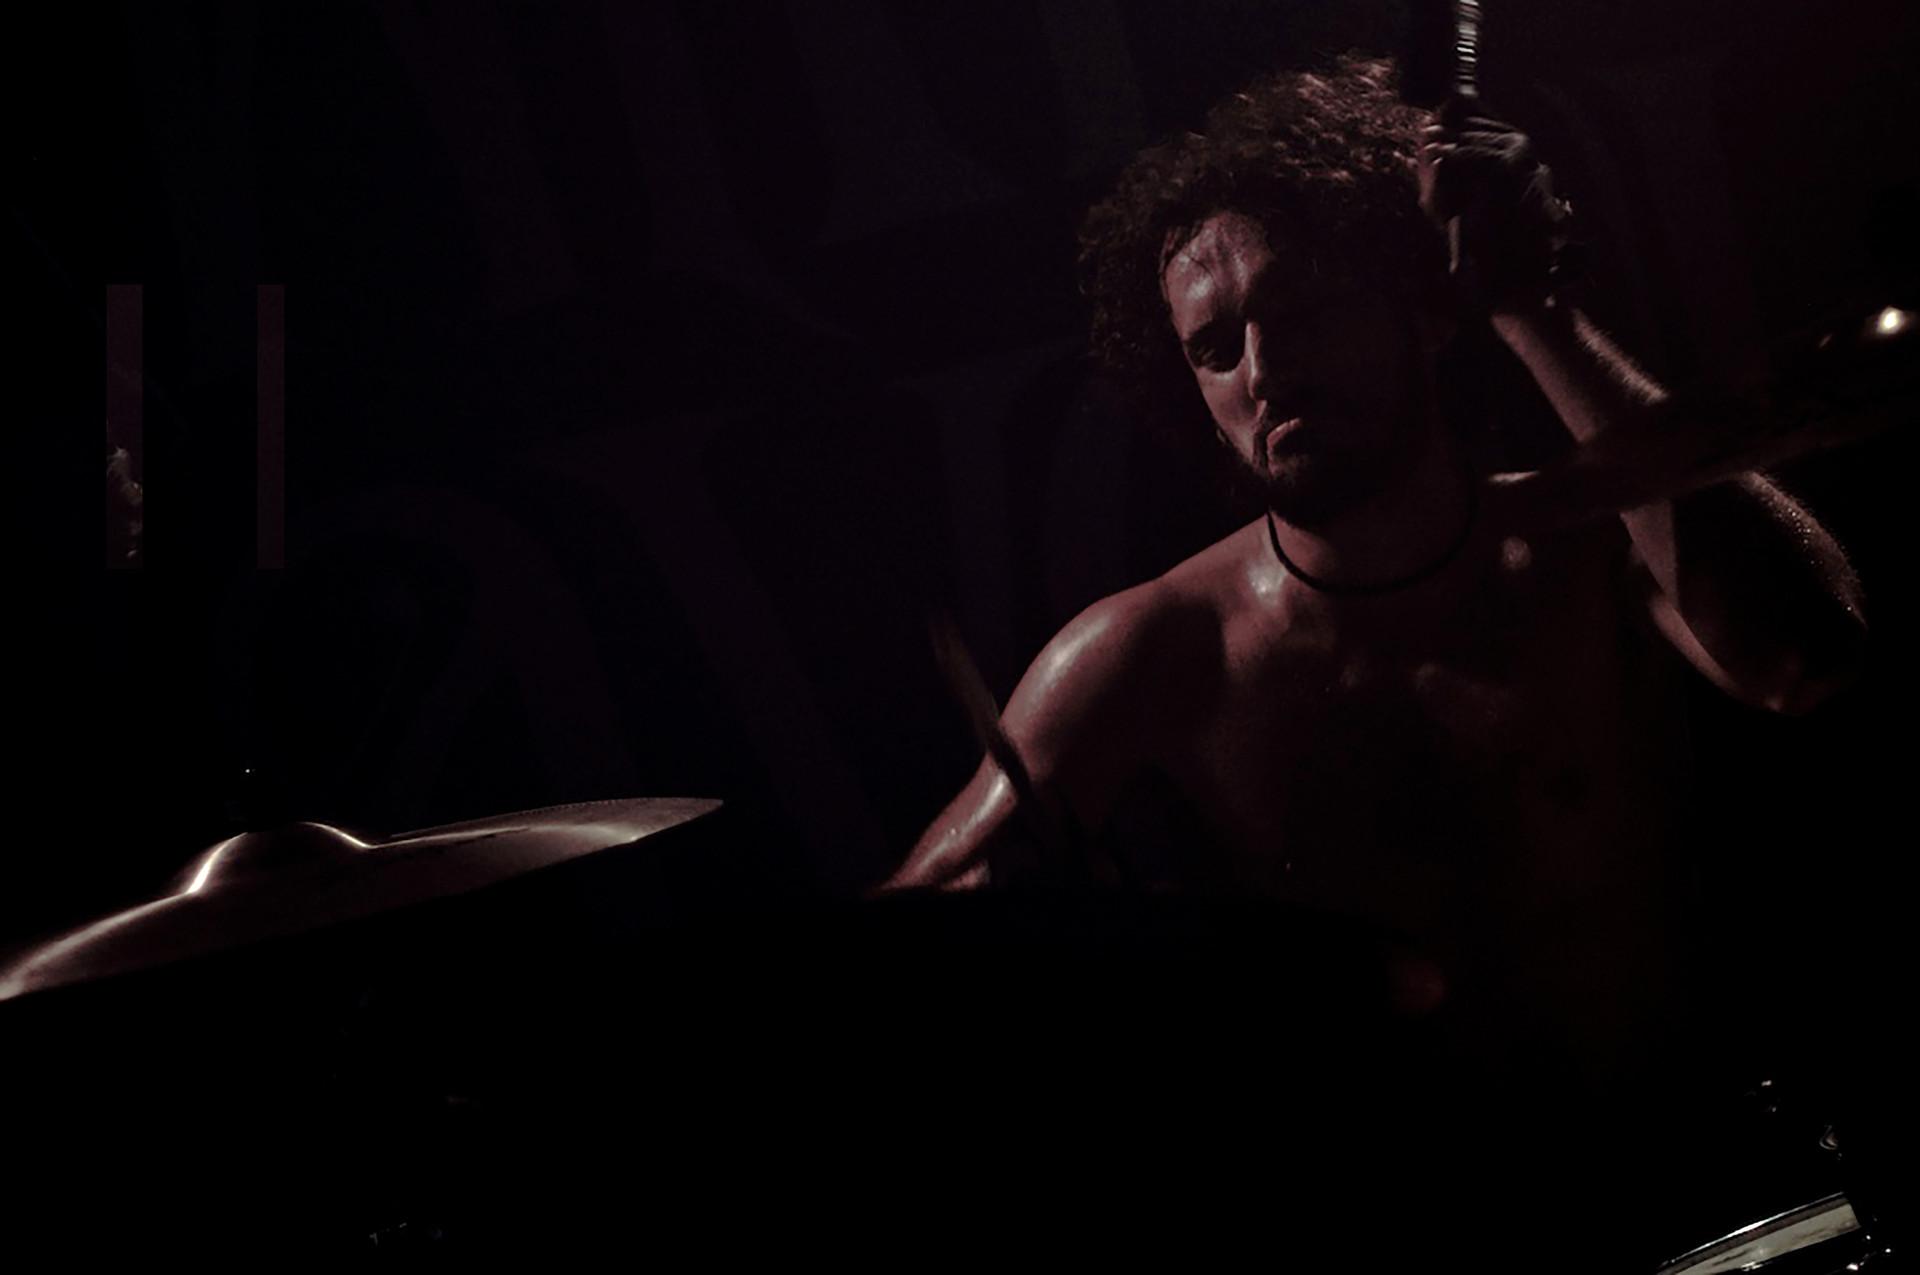 Kertone Production - Jerkov Musiques - My Own Private Alaska (MOPA) - Yohan Hennequin - Photo Live Concert